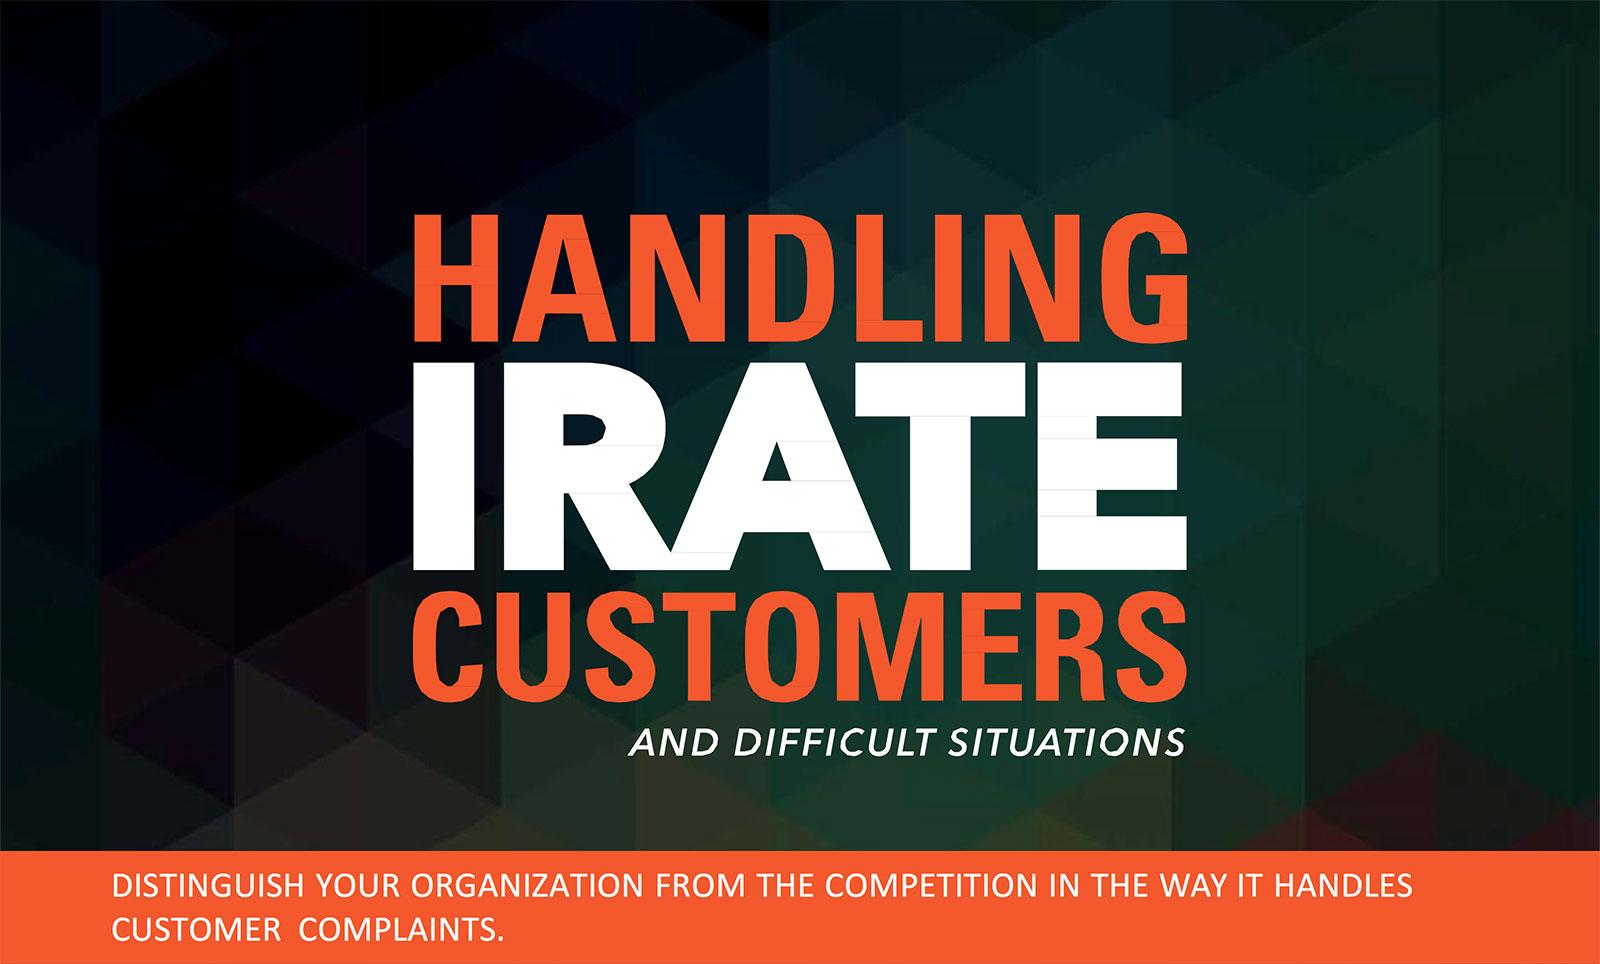 Handling Irate Customers